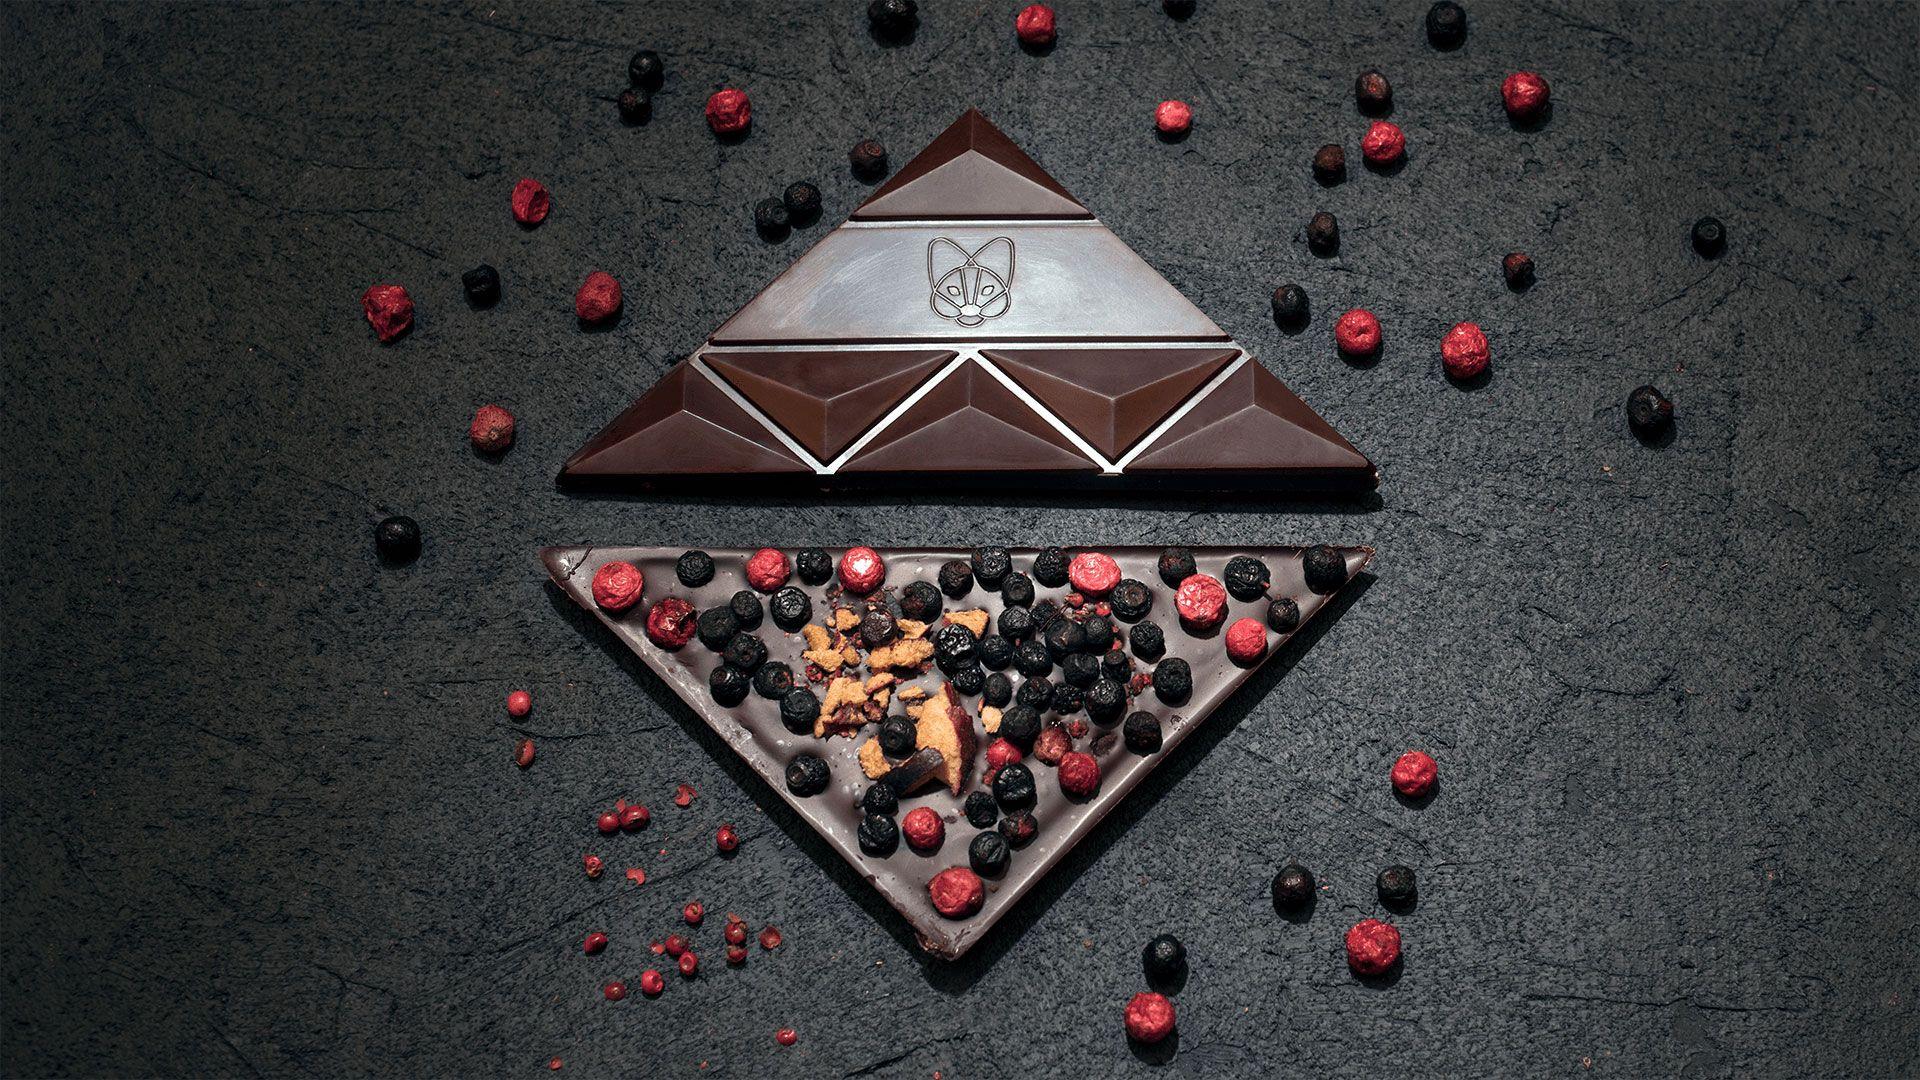 Aguara chocolate dedicated to wine Prokupac